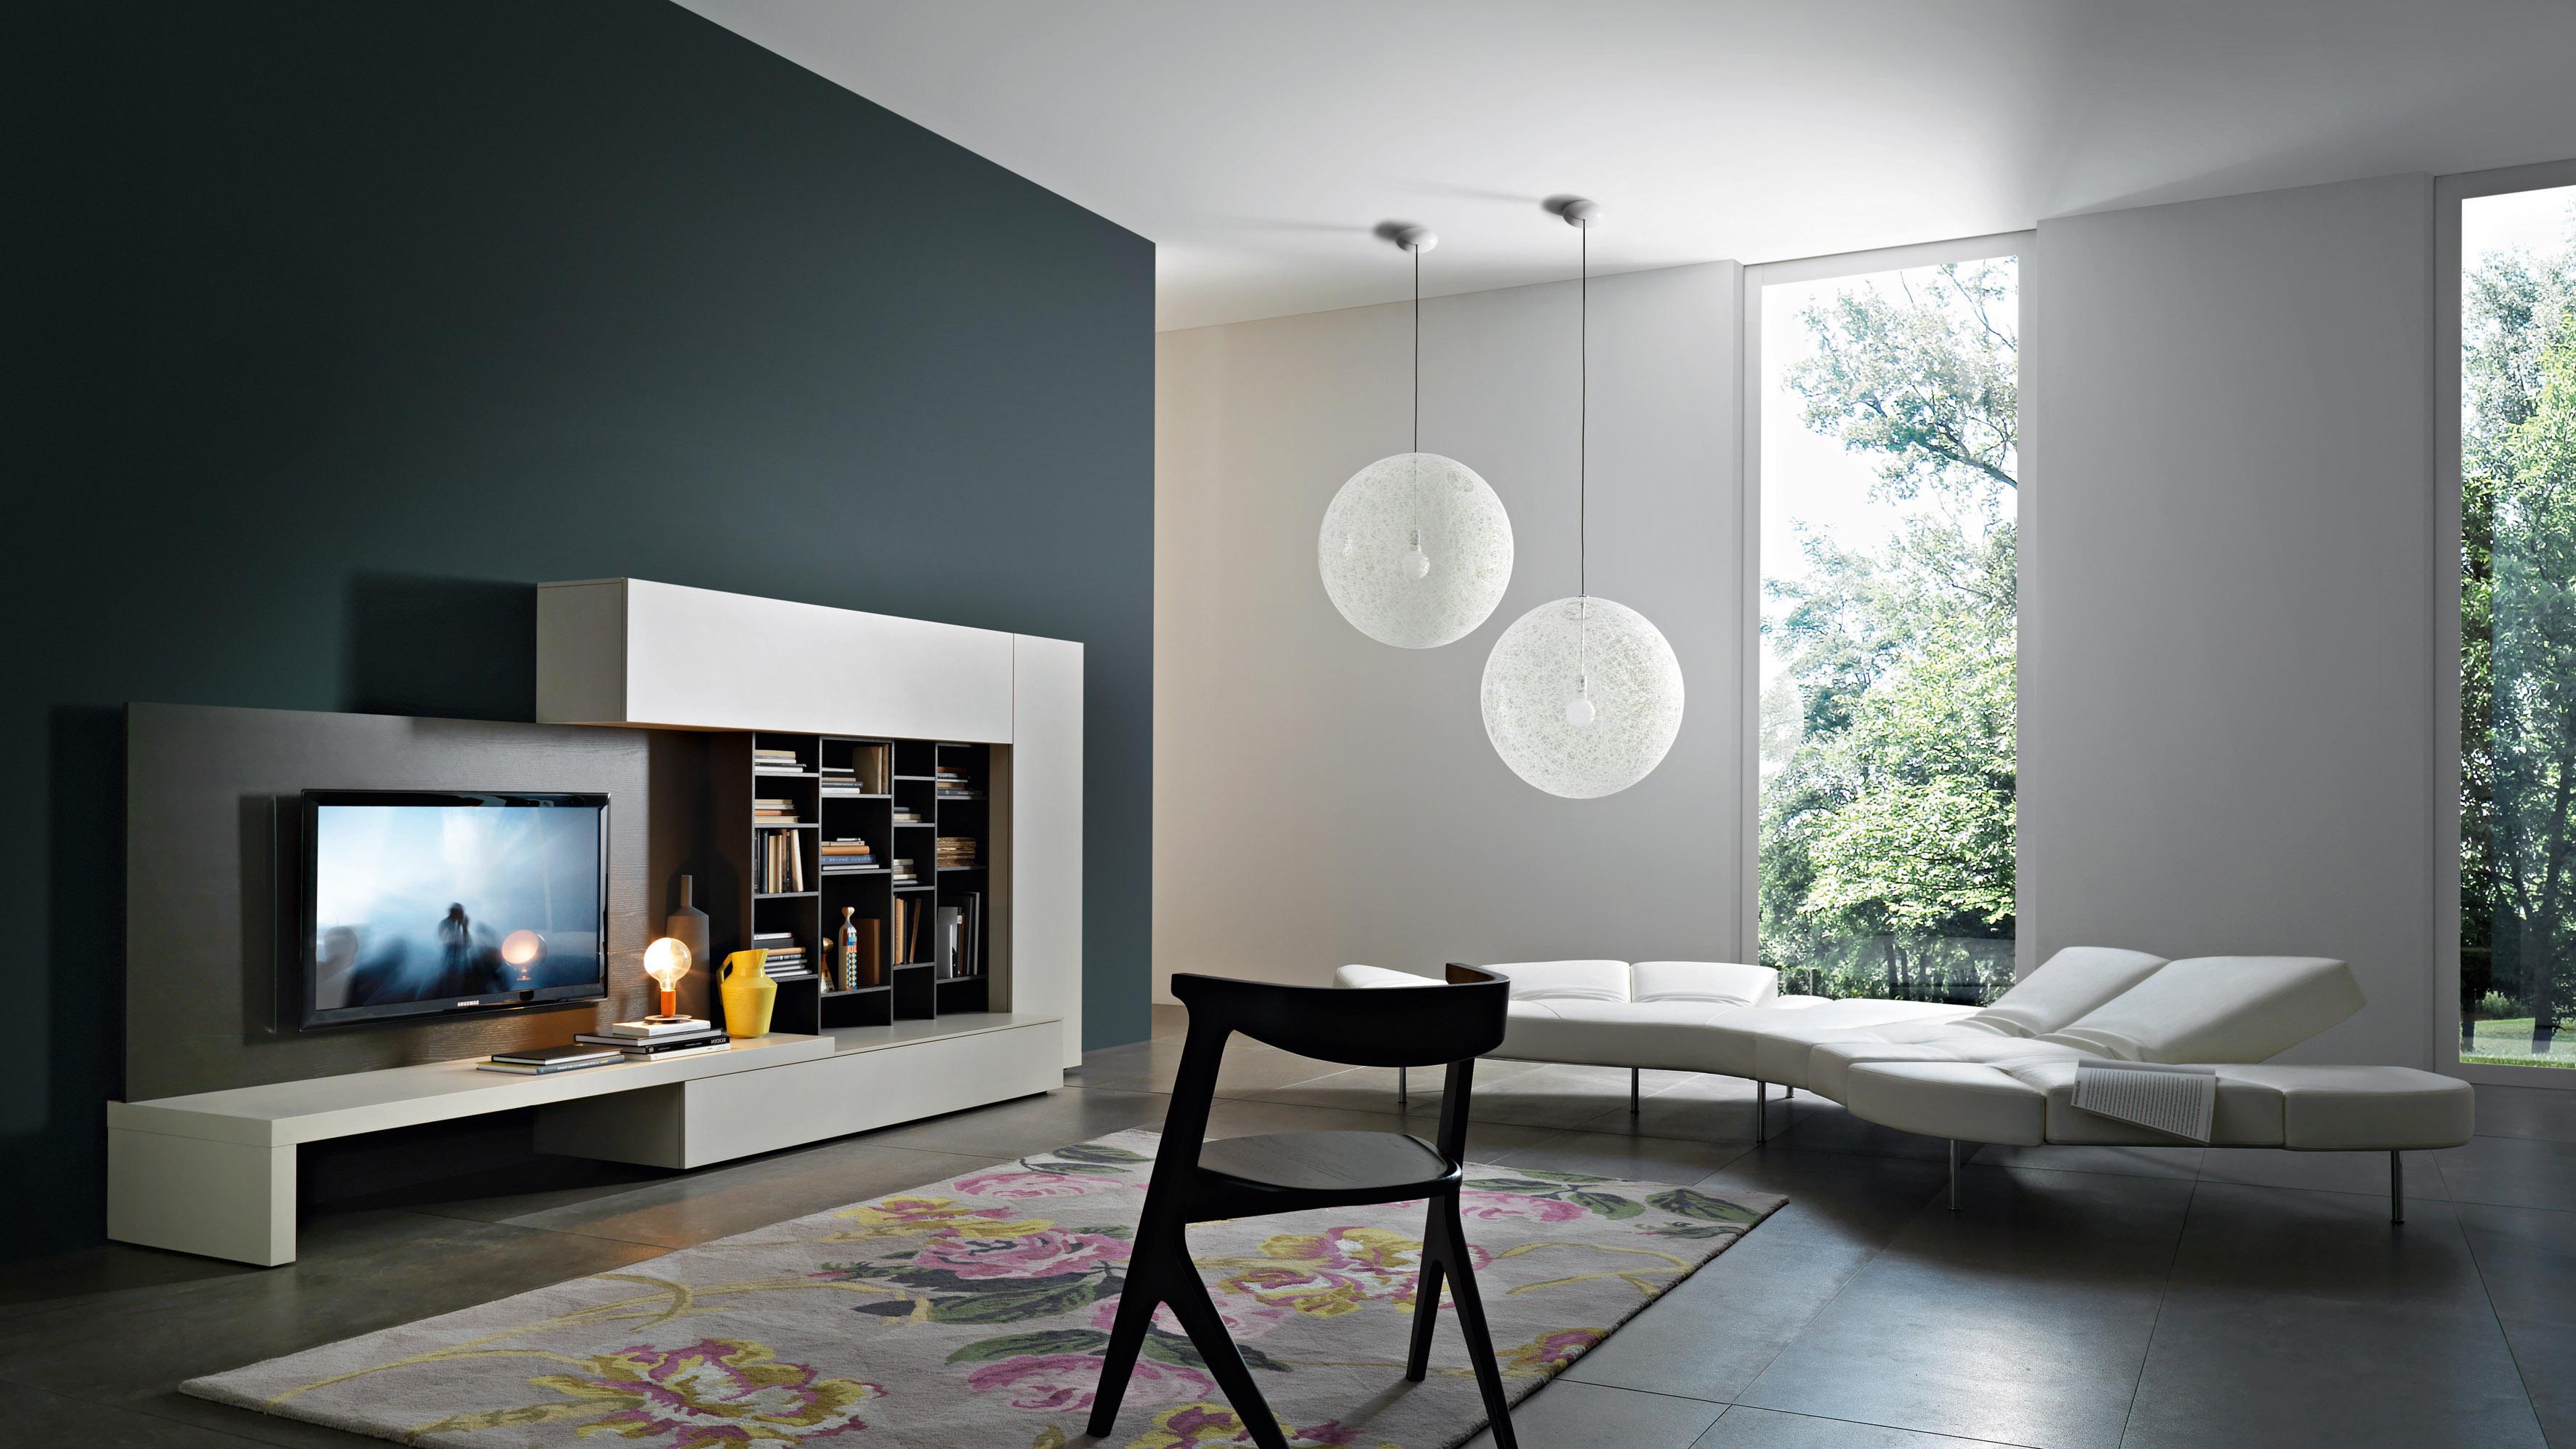 sangiacomo living system. Black Bedroom Furniture Sets. Home Design Ideas